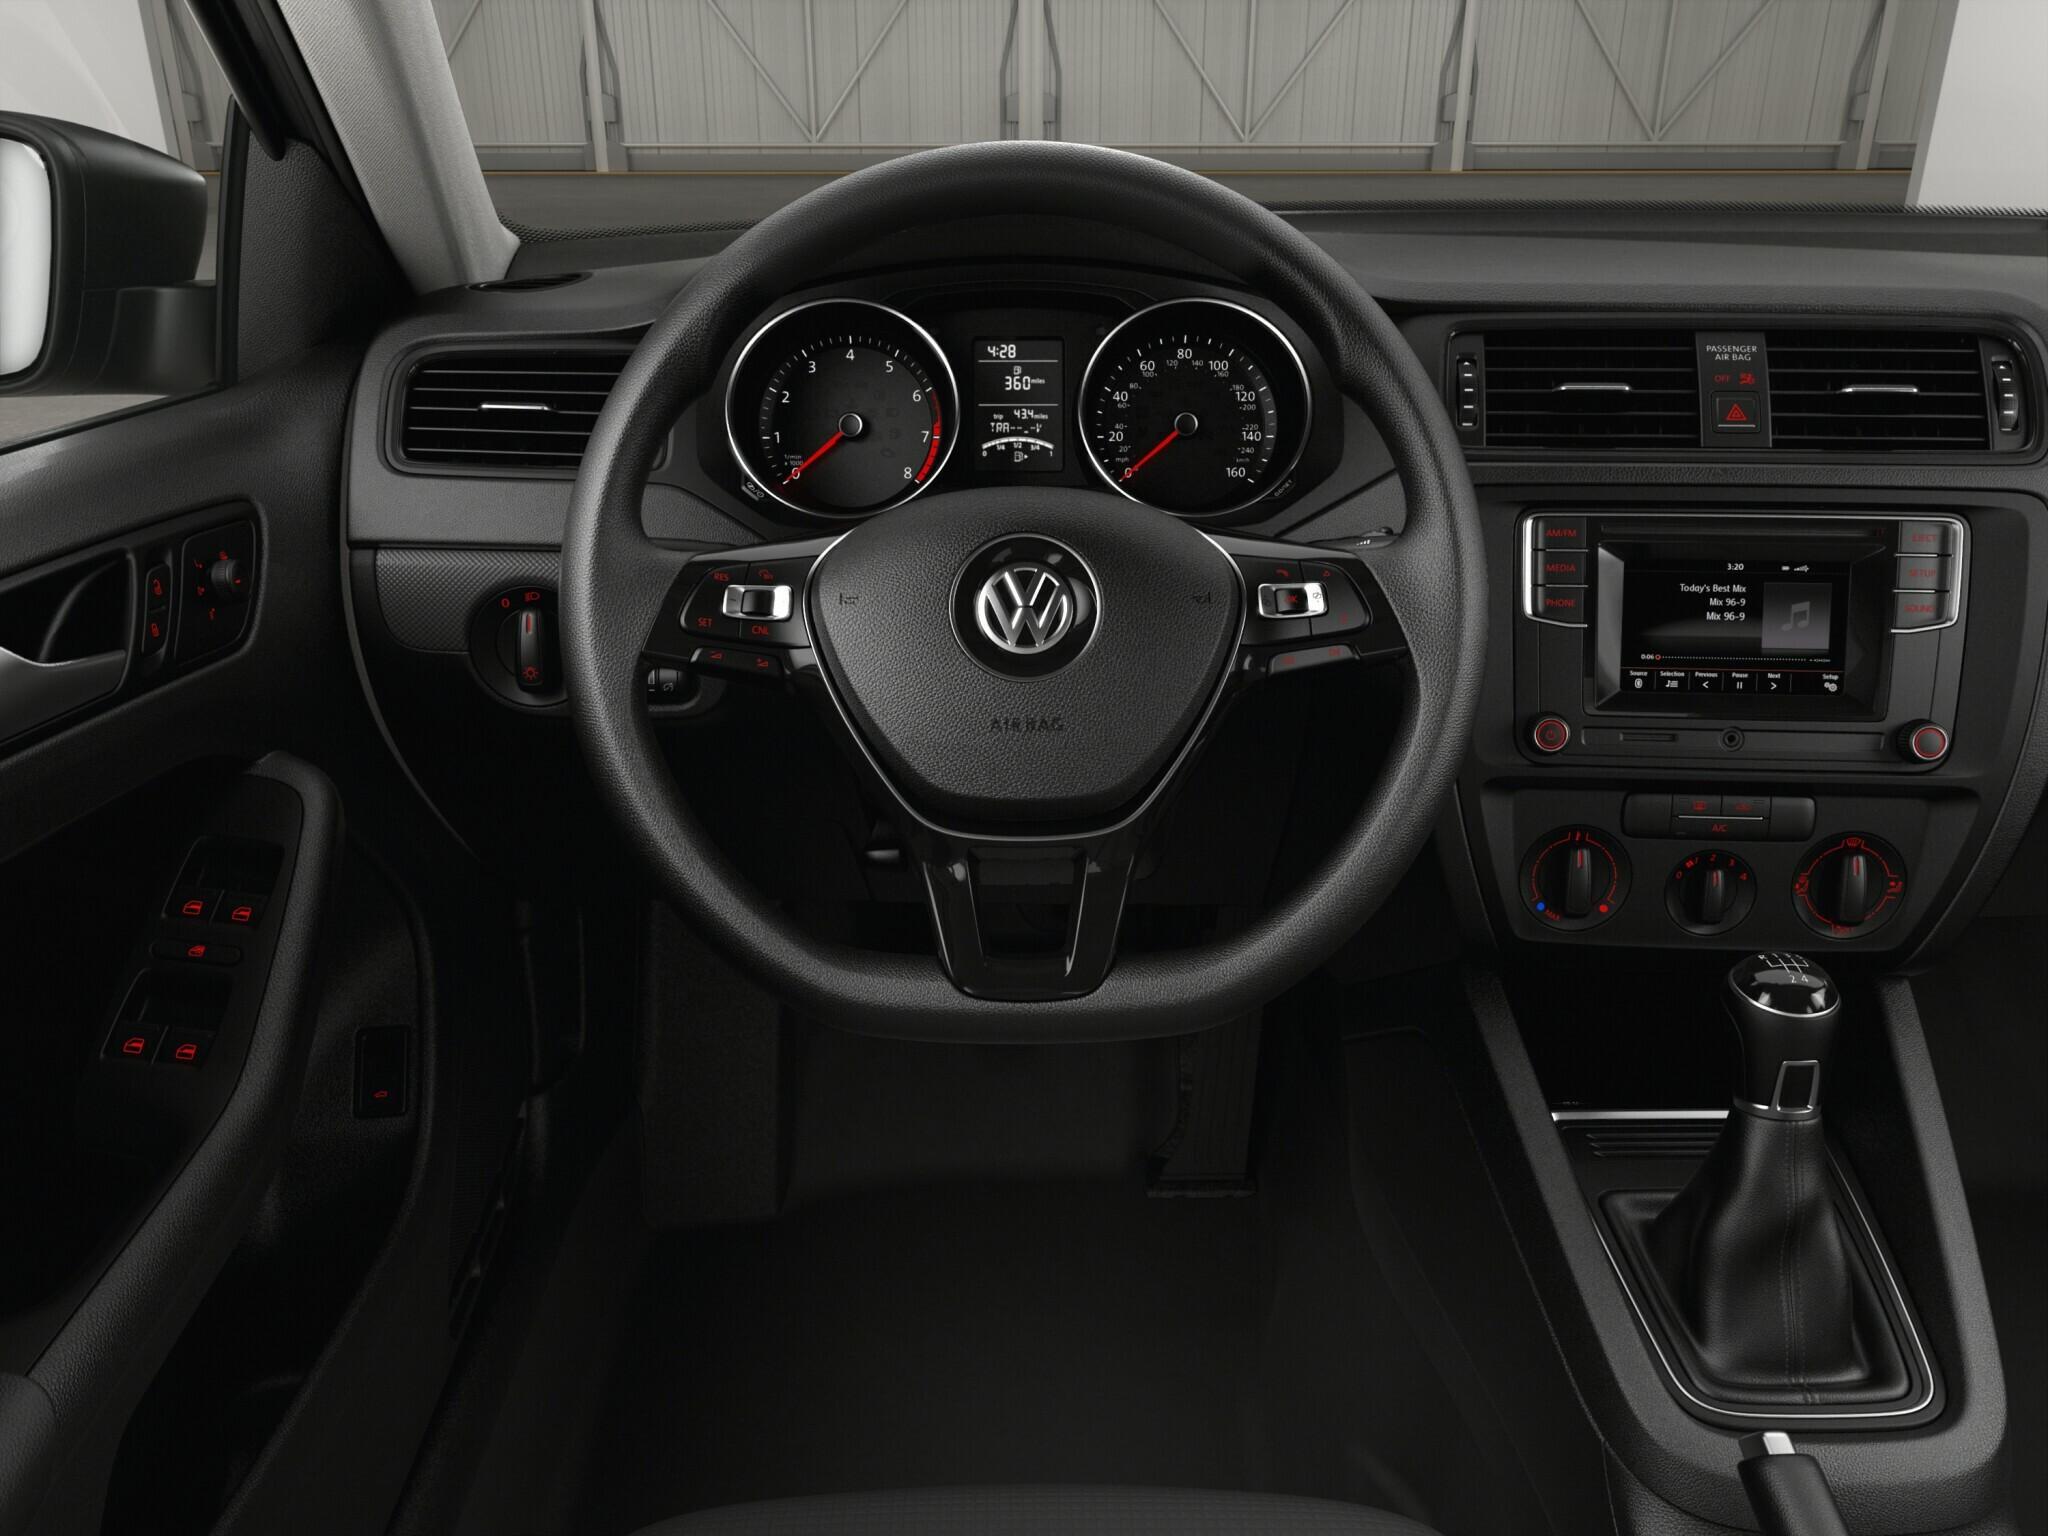 2016 Volkswagen Jetta 1.4 Ts >> 2016 Vw Jetta 1 4t S Trim Volkswagen